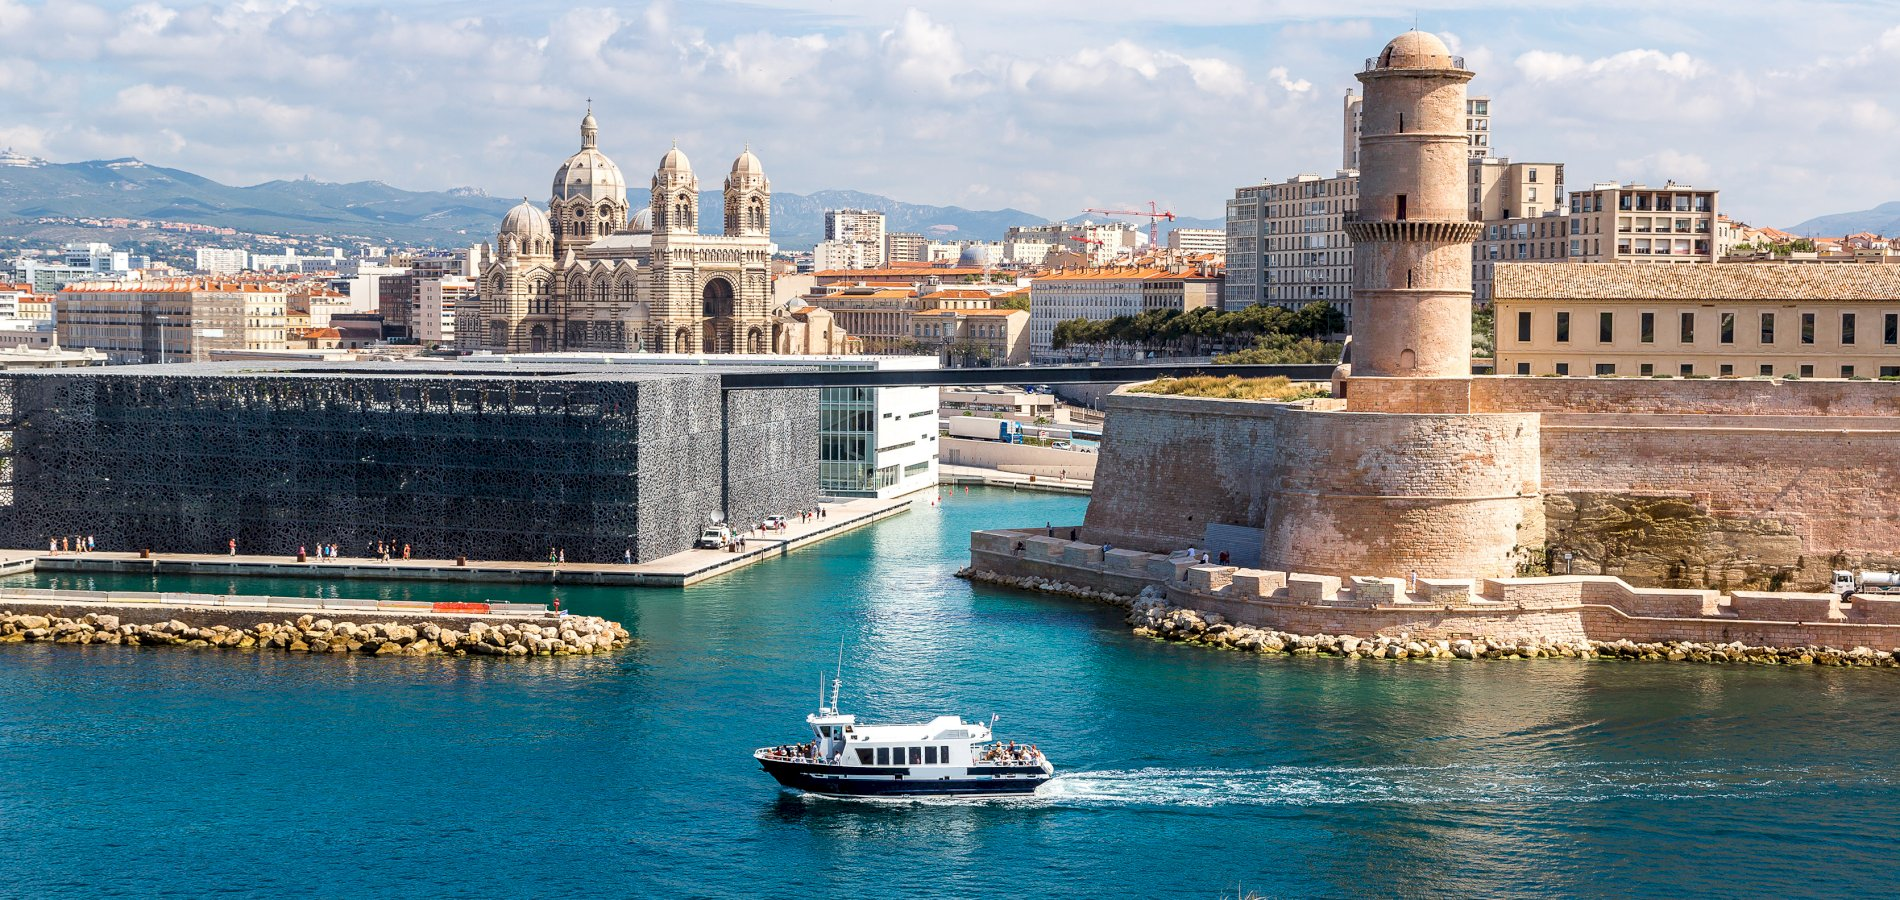 Ophorus Tours - Marseille & Provence Wine Tasting Tour Private Shore Excursion From Toulon